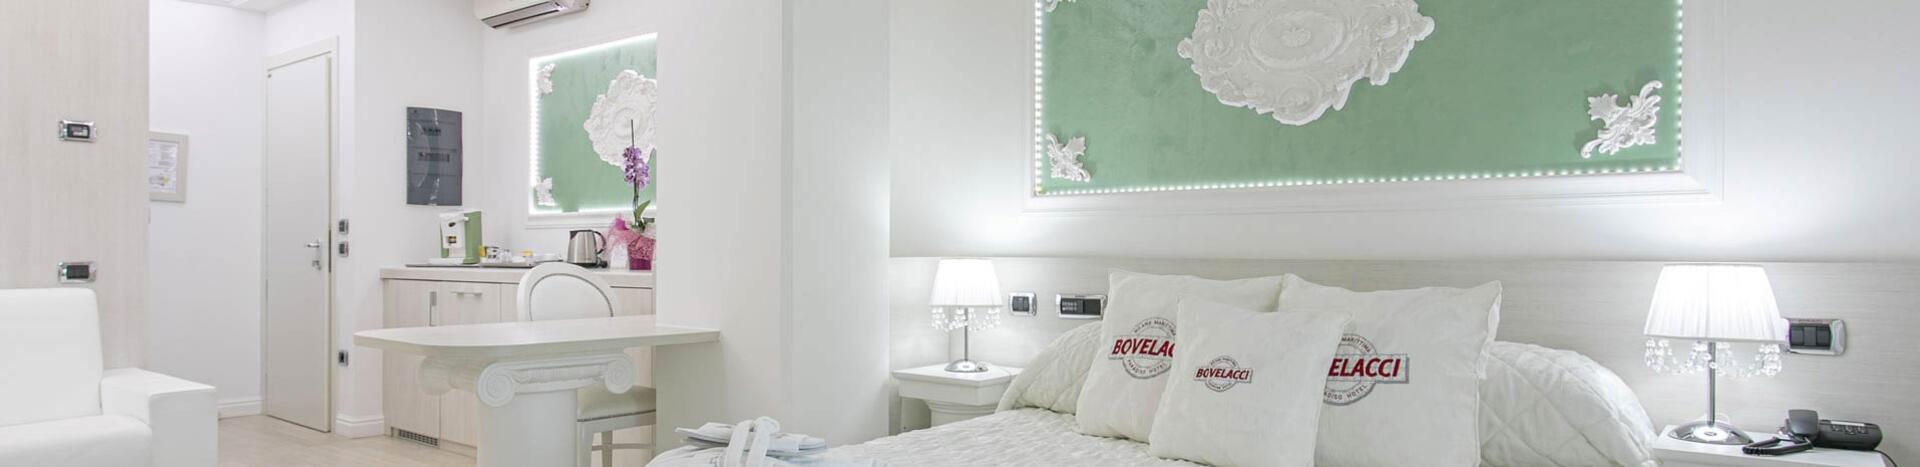 hotelparadisomilanomarittima en tonic-room 001